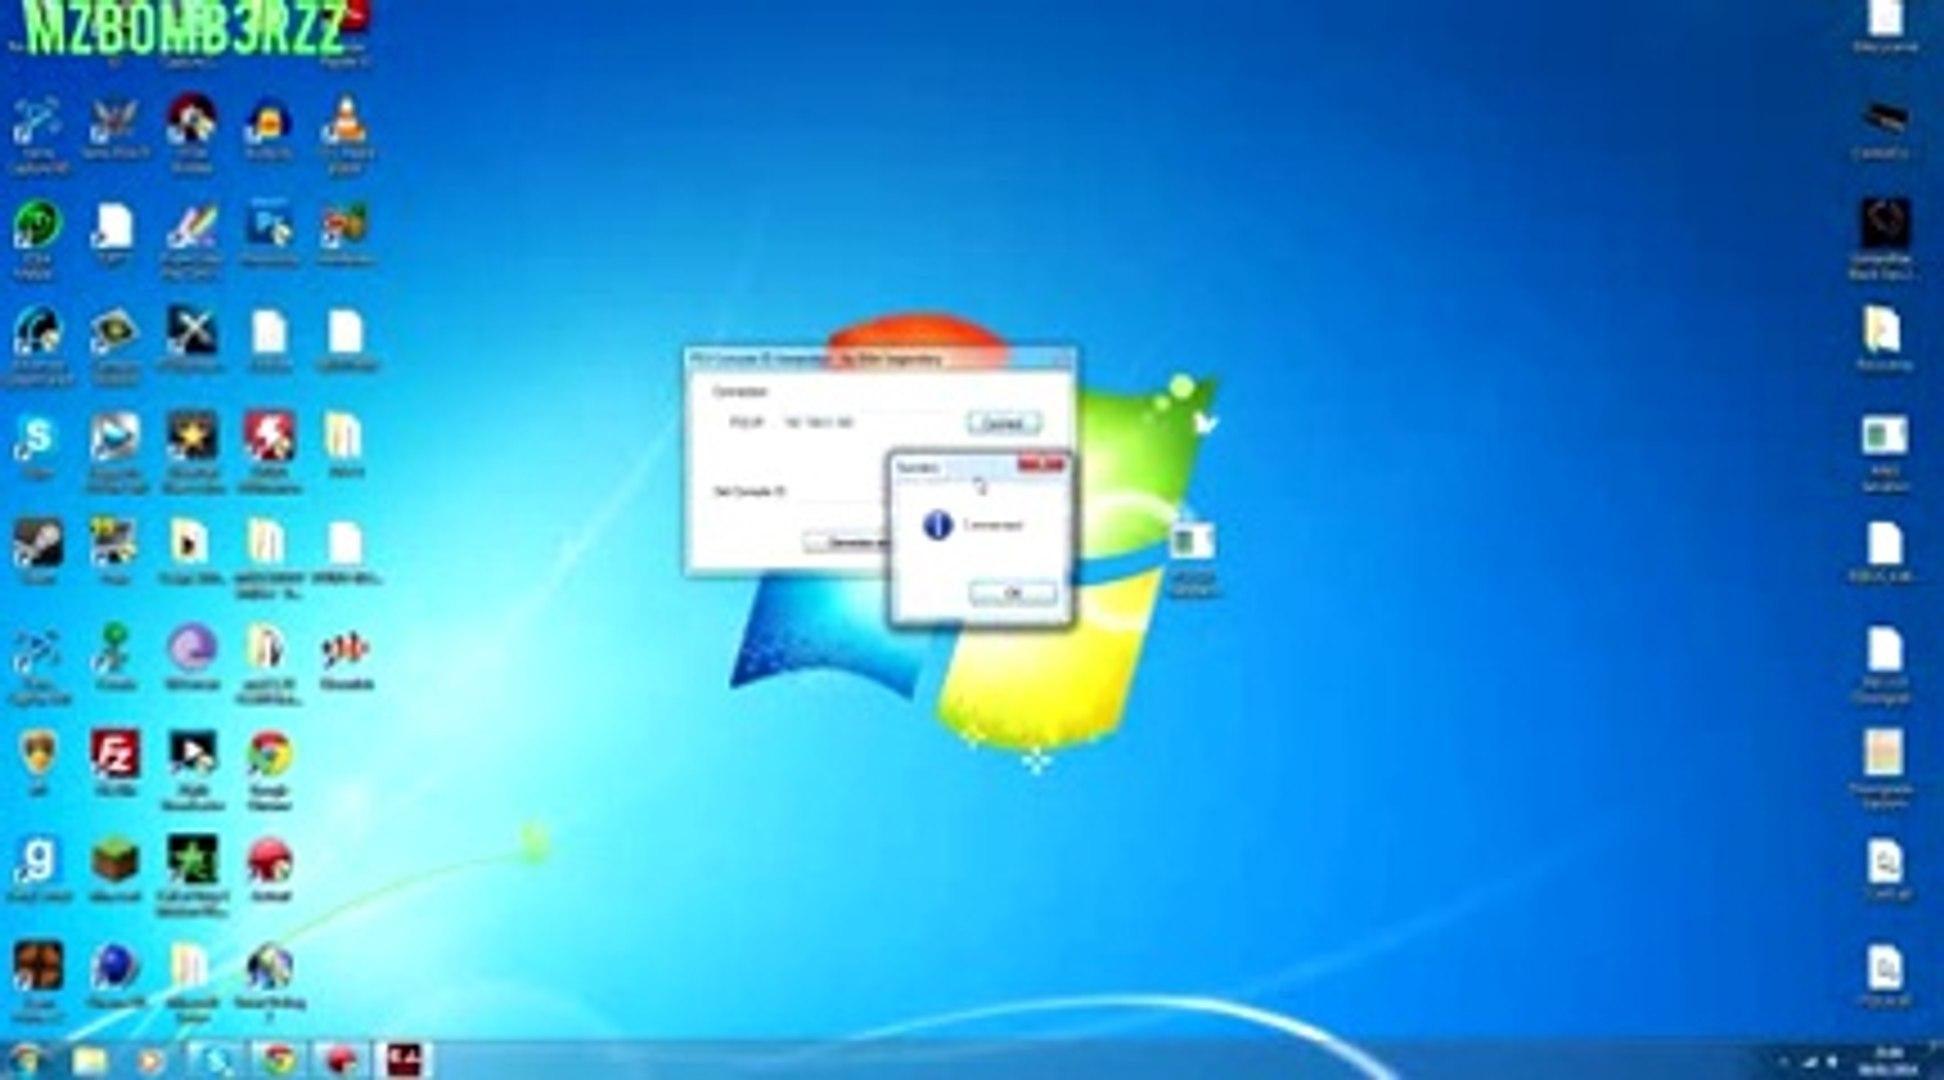 PS3 Console ID Generator ¬ Keygen Crack + Torrent FREE DOWNLOAD